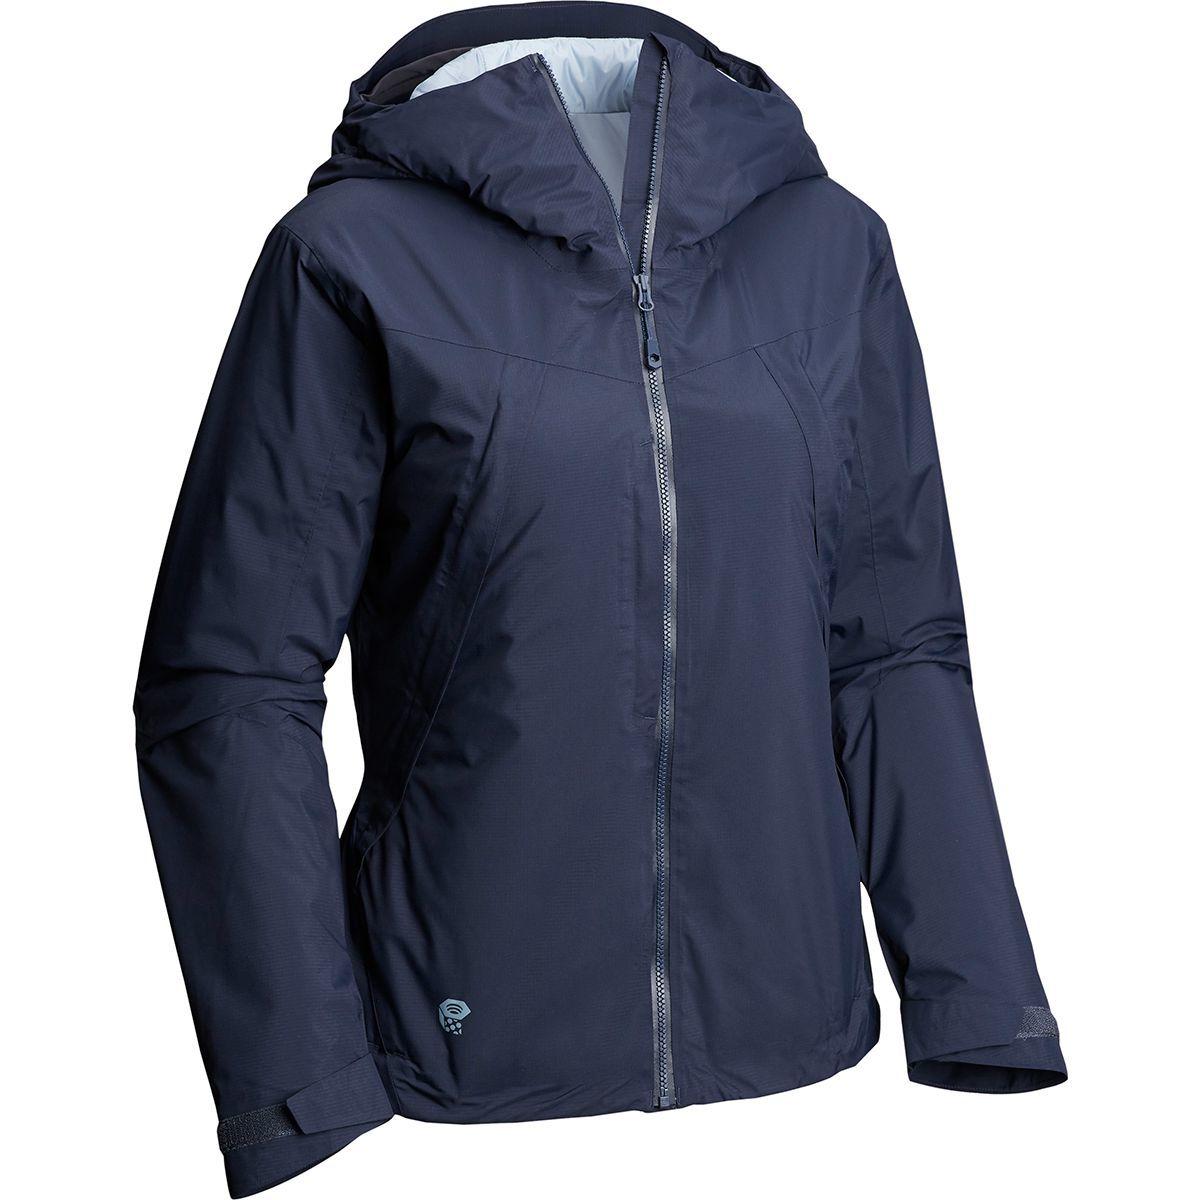 Mountain Hardwear Marauder Insulated Jacket - Women's